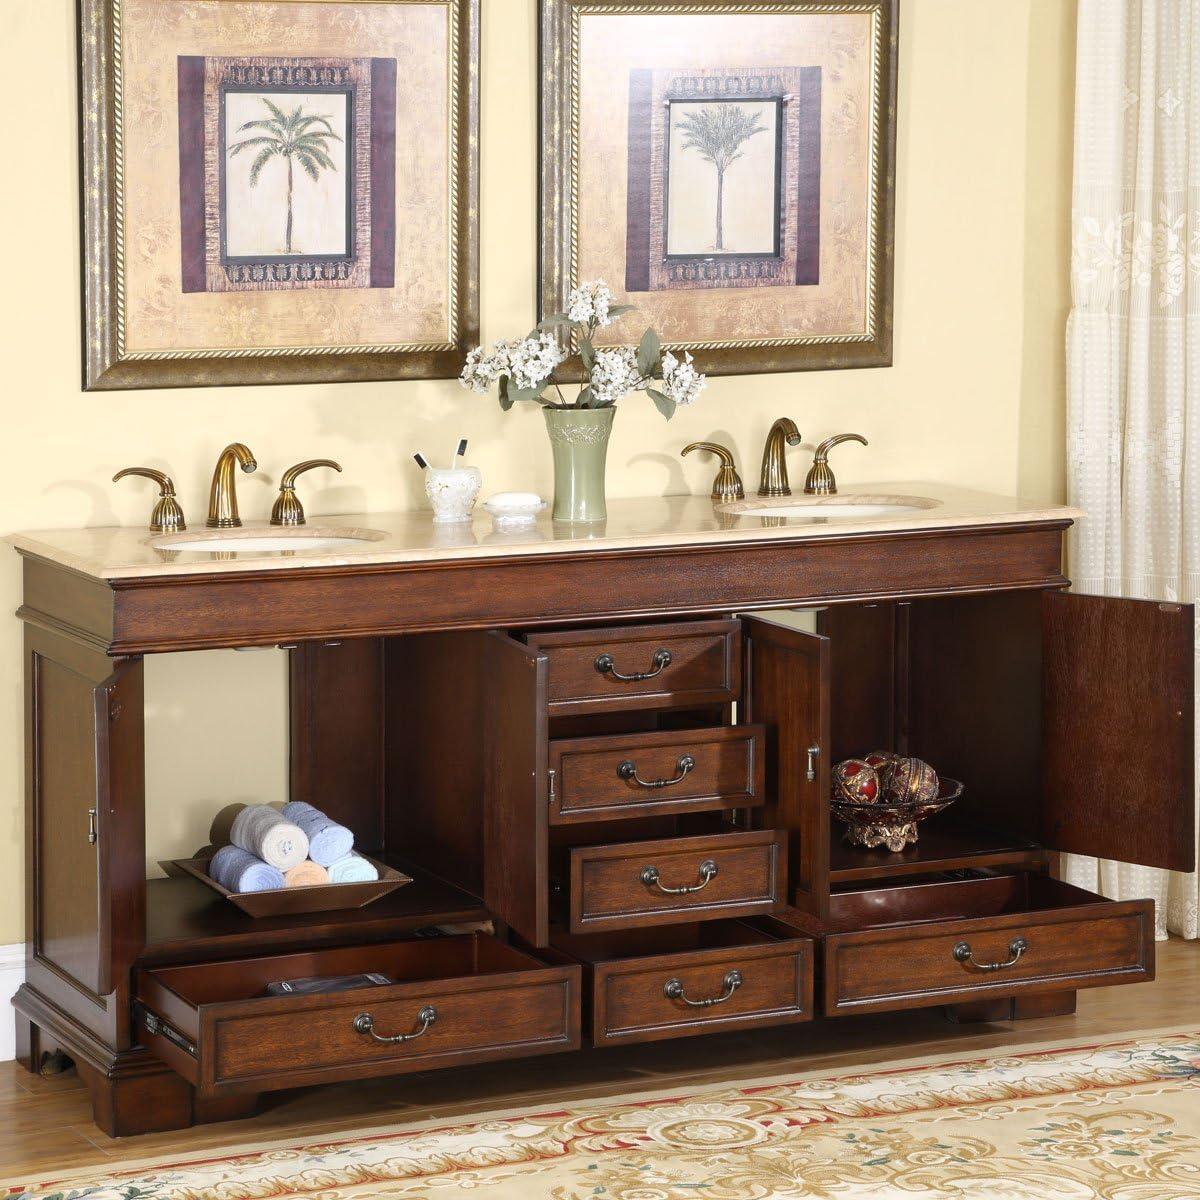 Buy Silkroad Exclusive Travertine Stone Top Double Sink Bathroom Vanity With Cabinet 72 Brown Online In Germany B005h7yyki